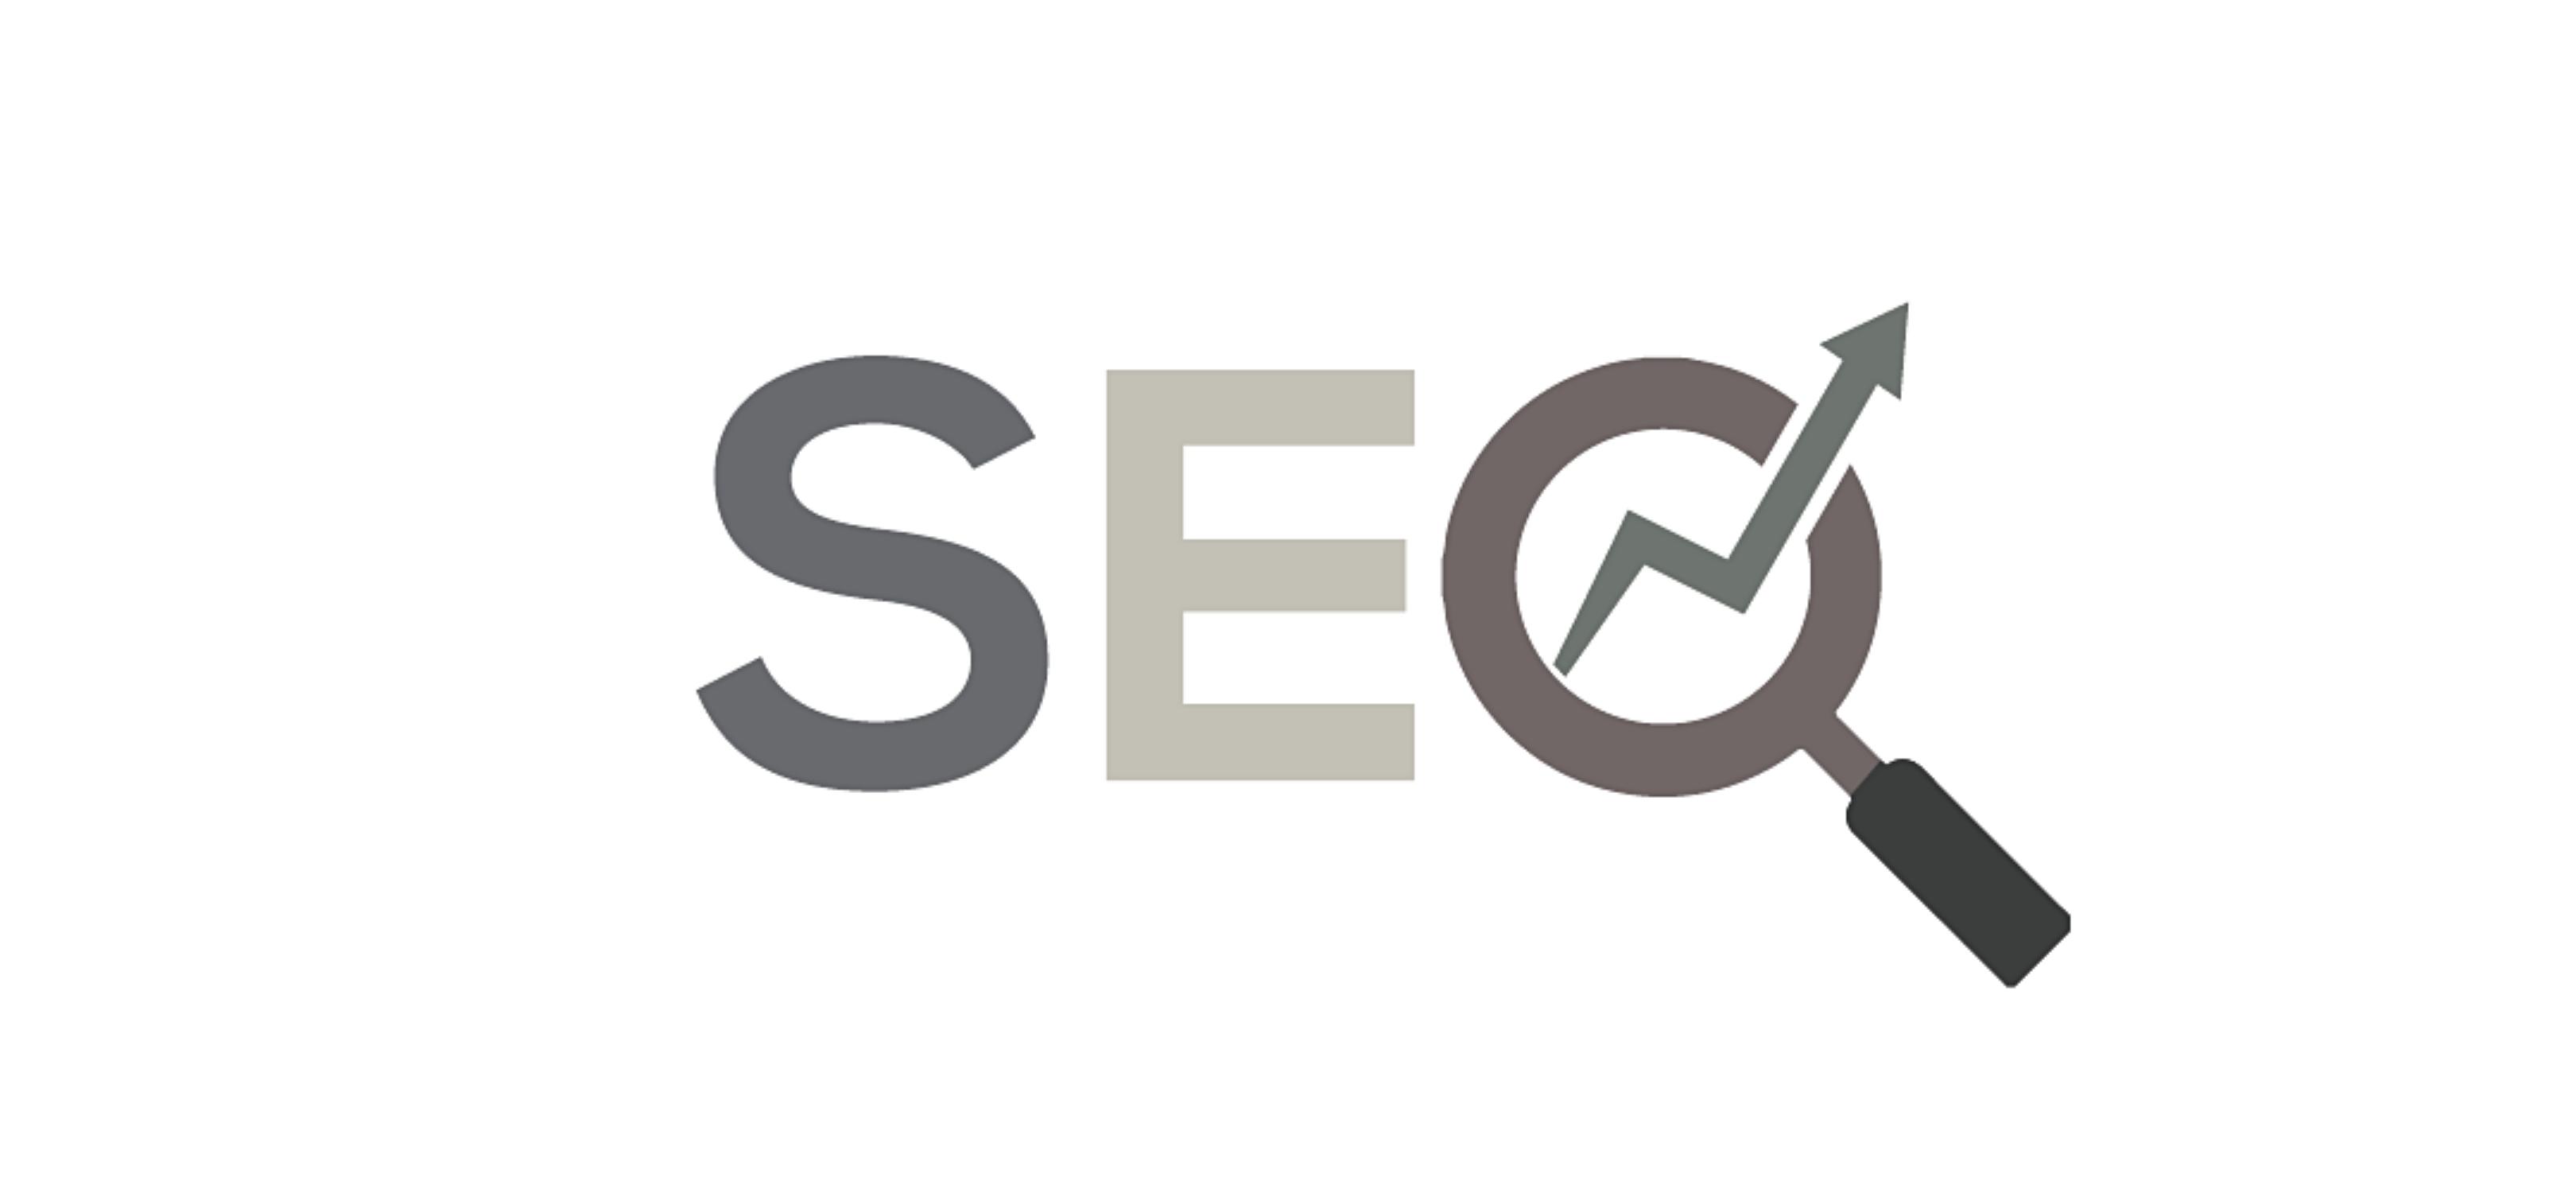 seo-google-logo